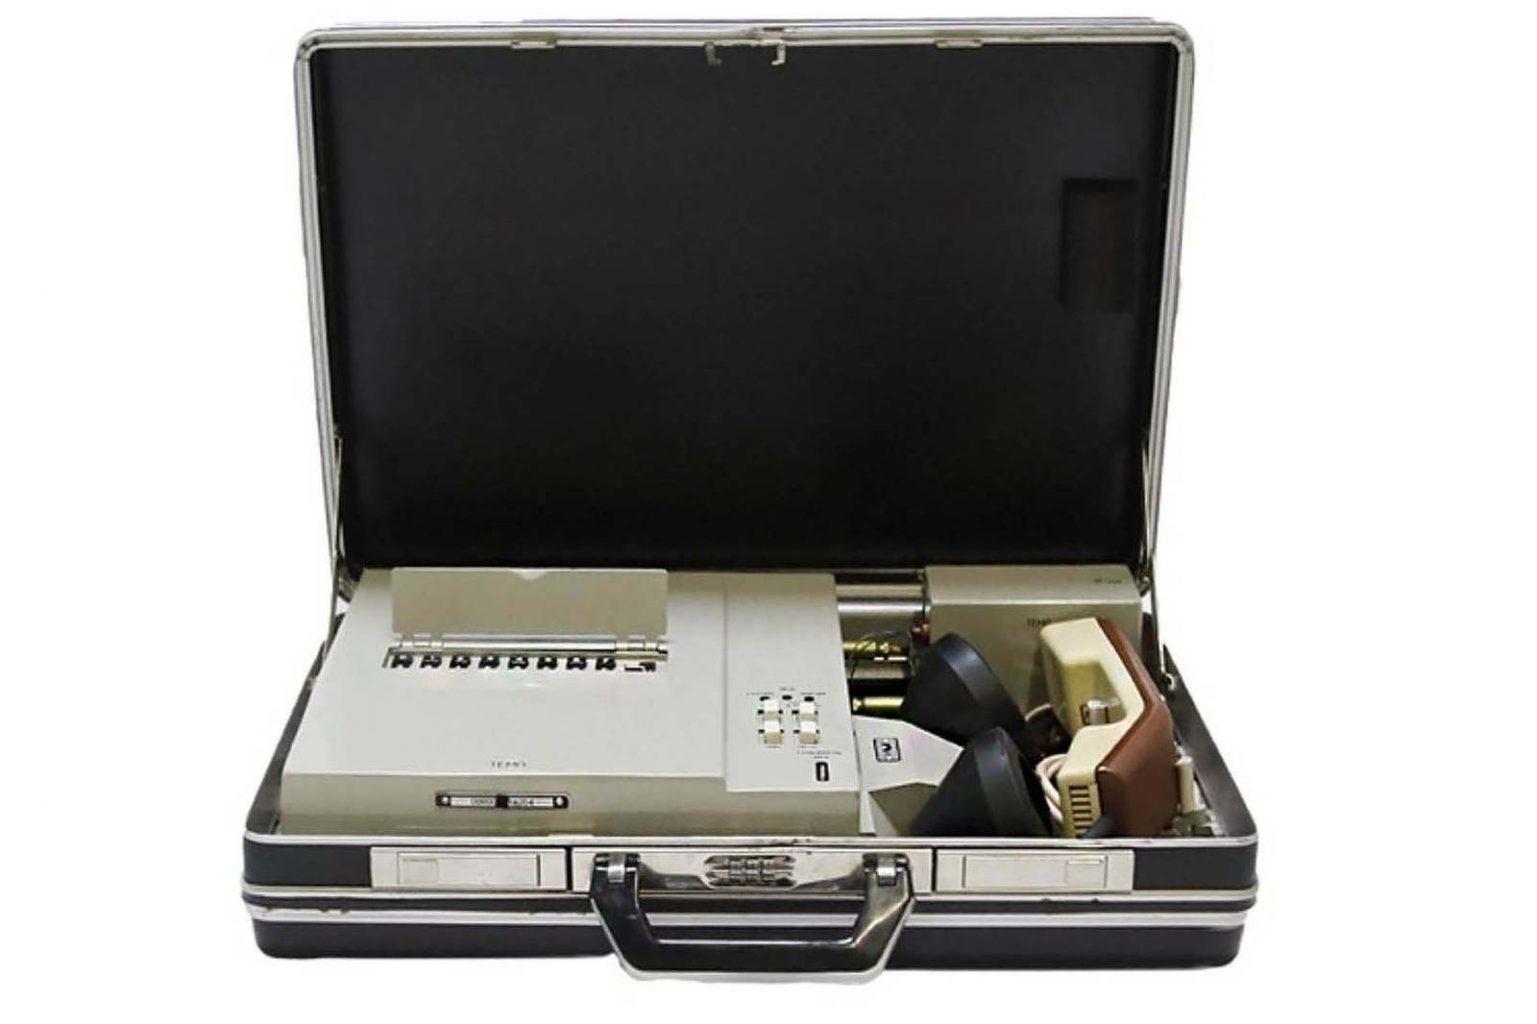 expo-kgb-valise-urss-communication-secrete